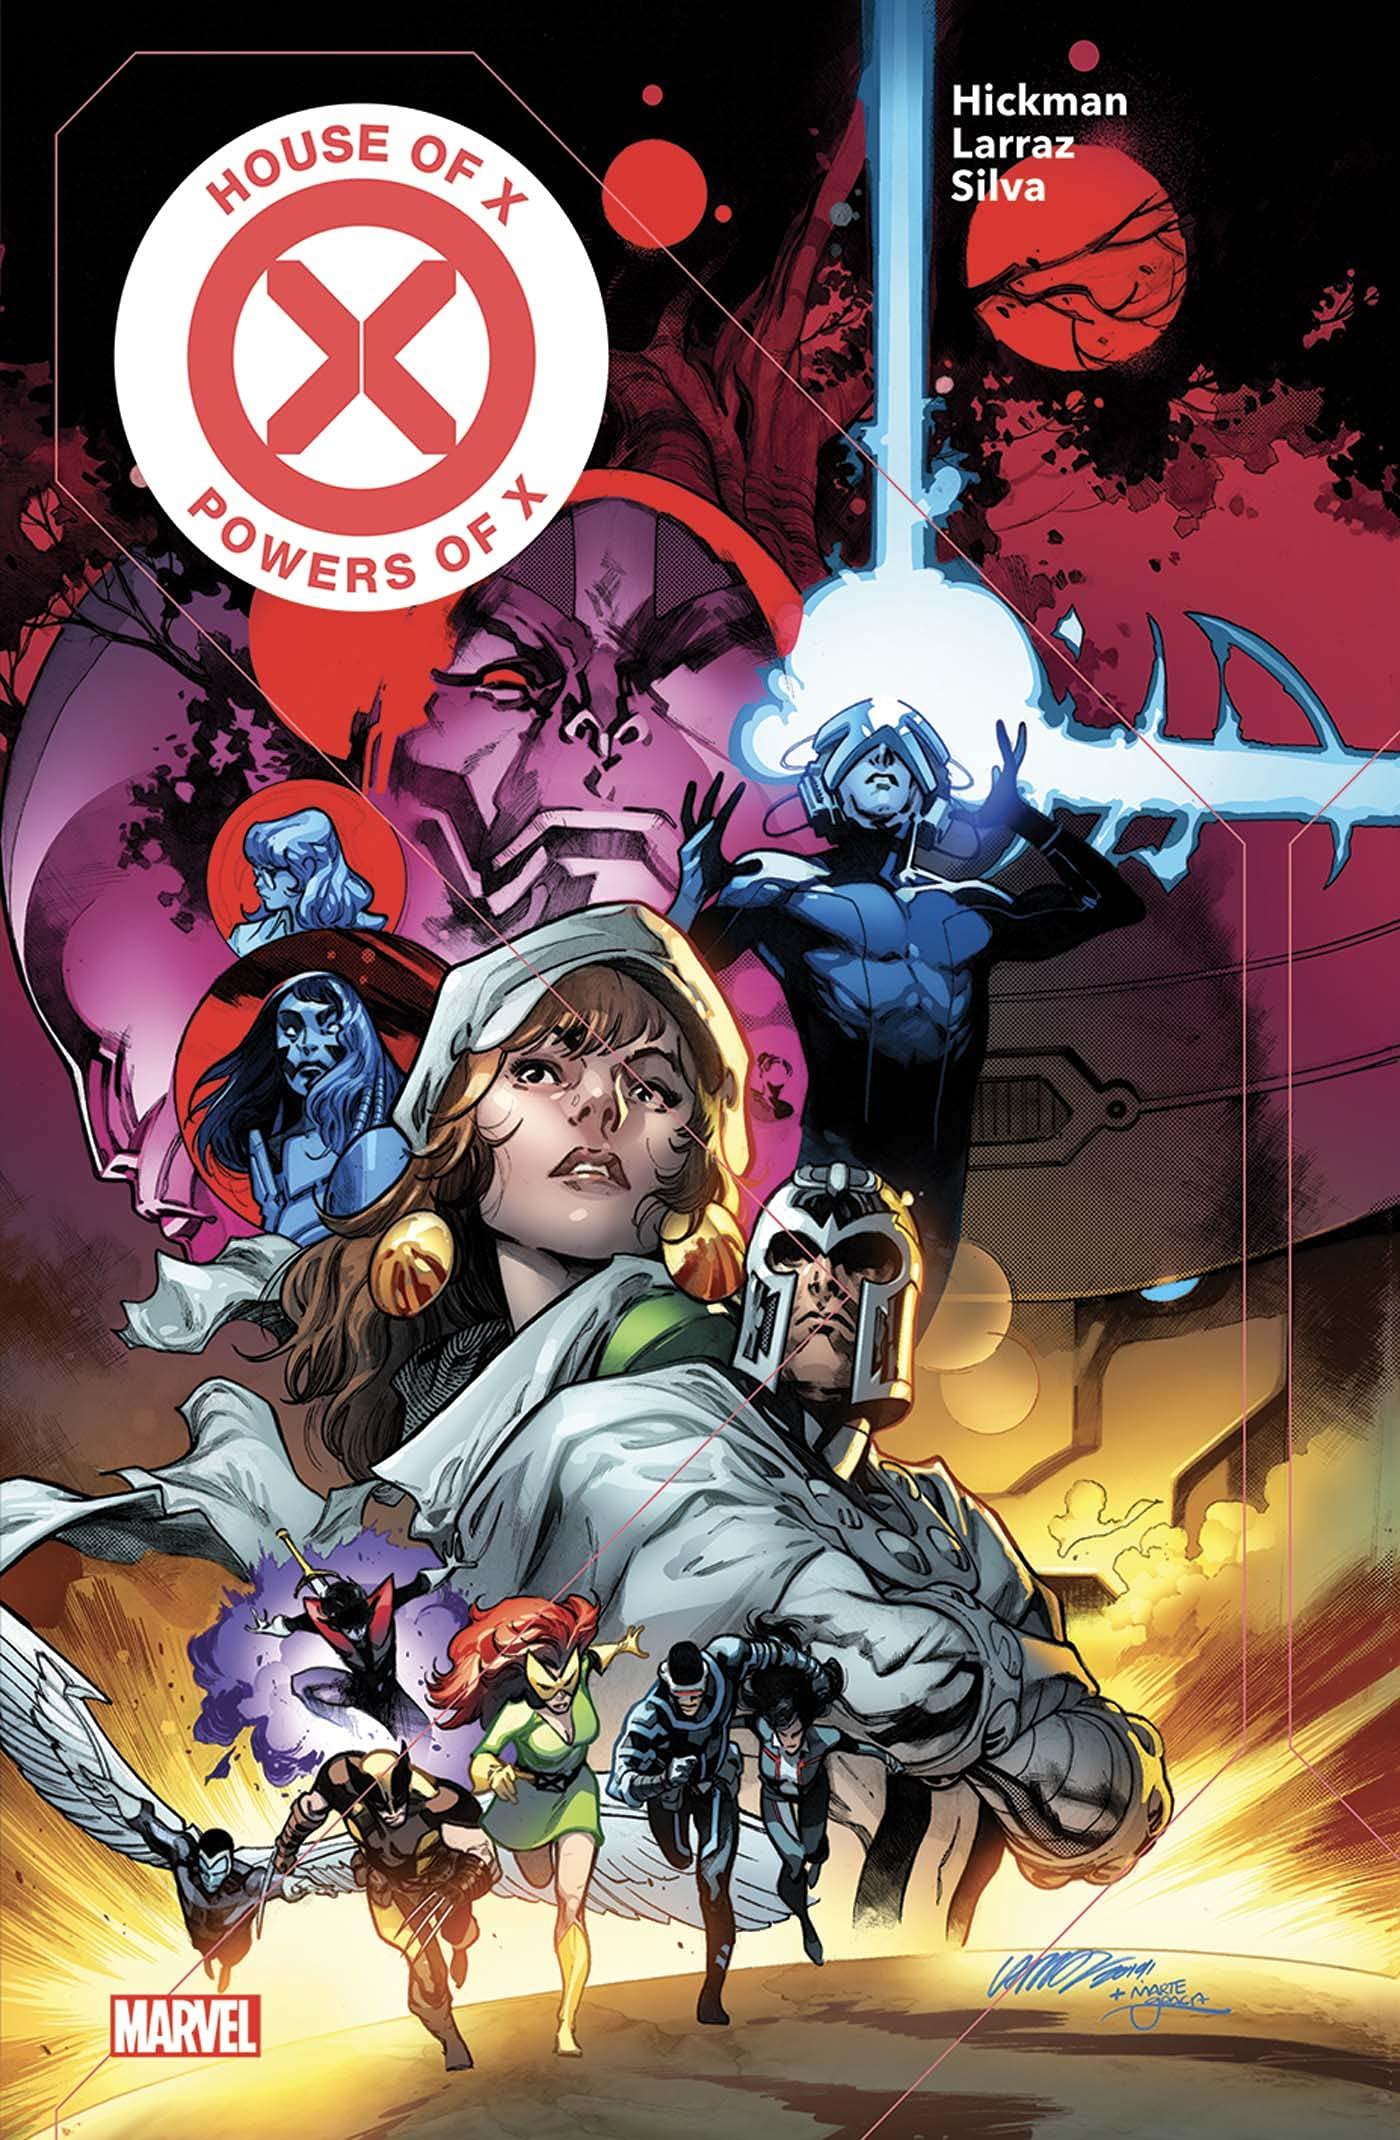 X-Men - House of X | Powers of X 1